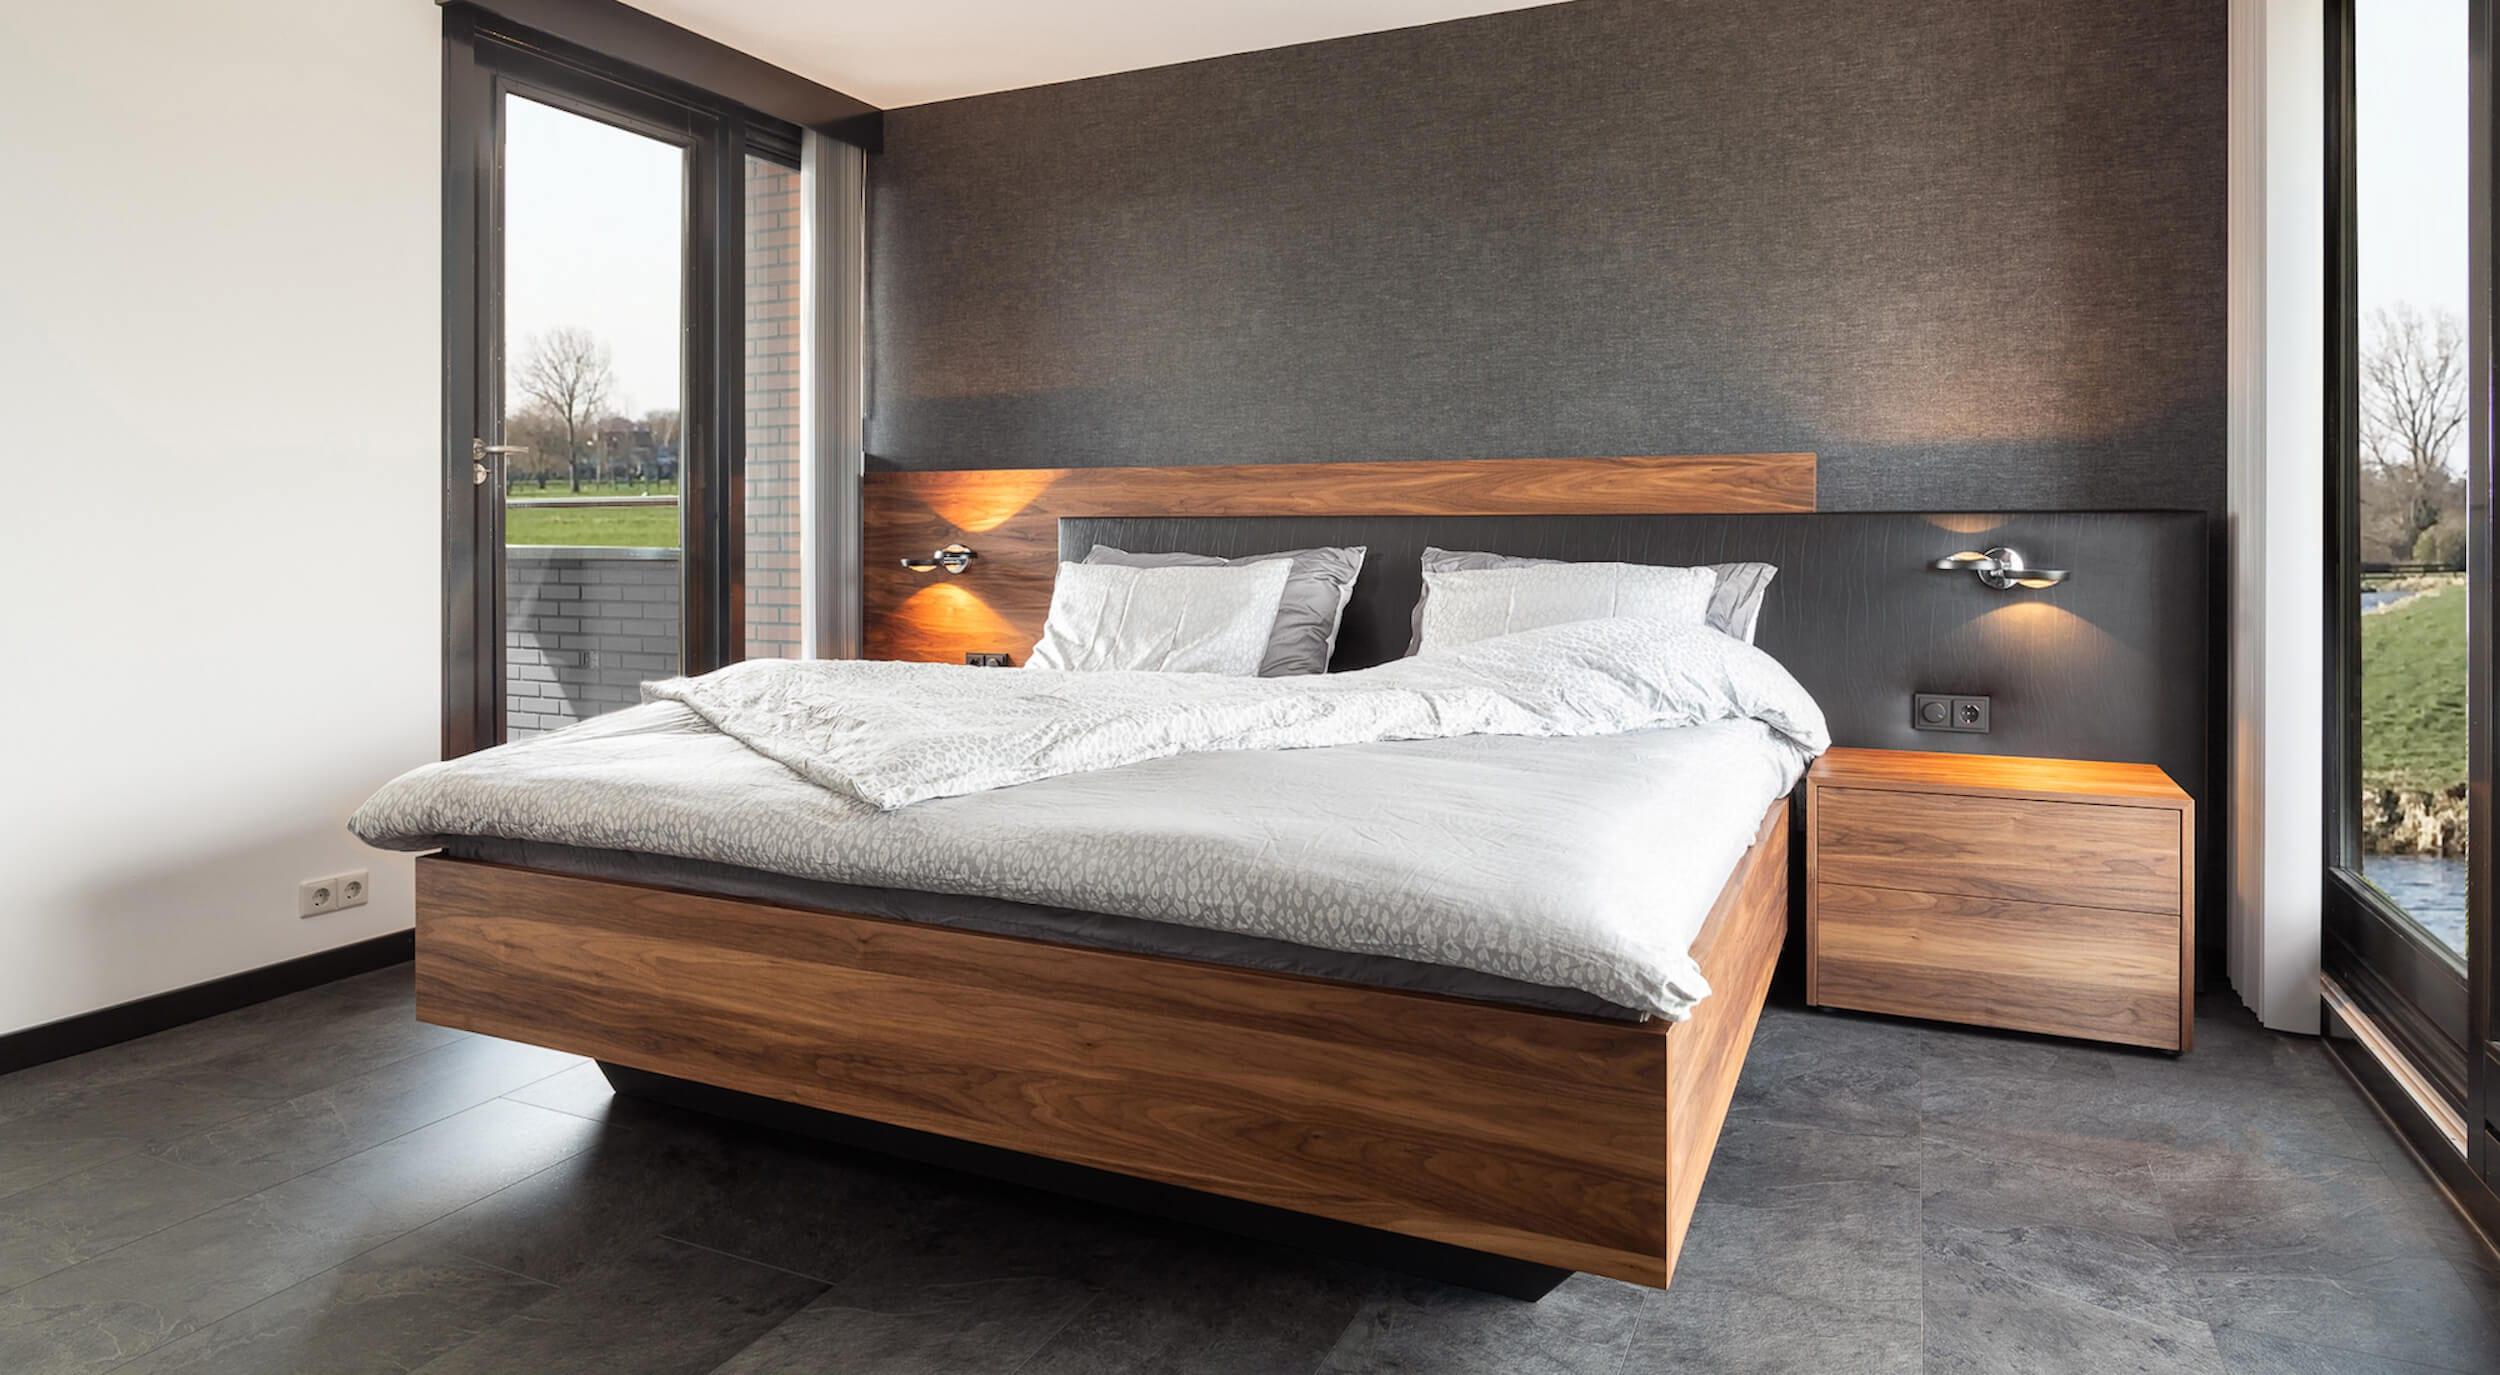 luxe design bedden